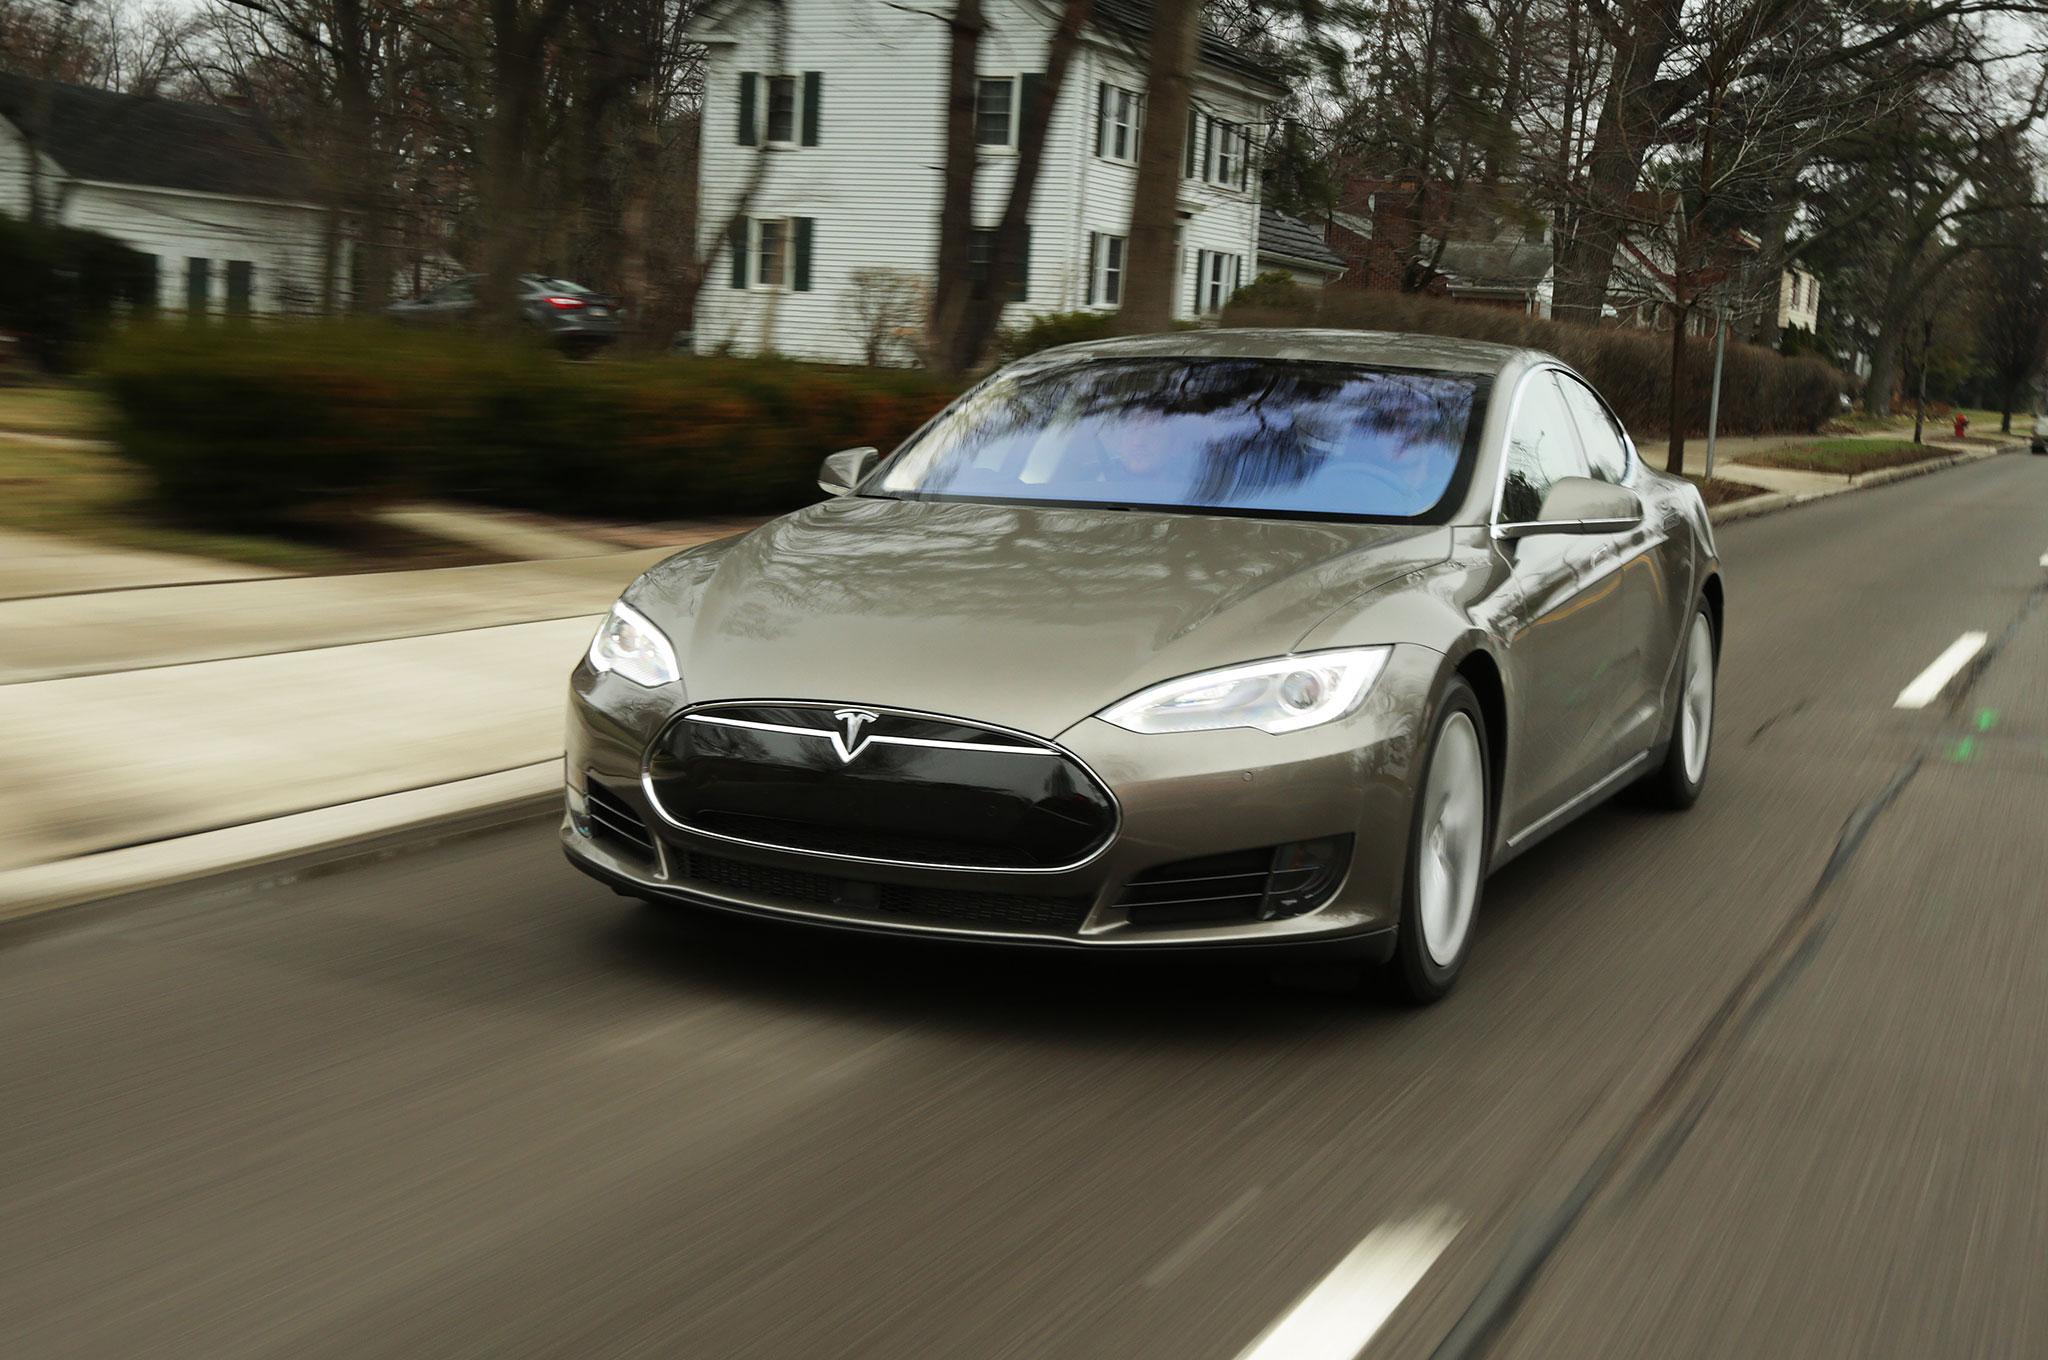 2015 Tesla Model S 70D Front Three Quarter Motion 3